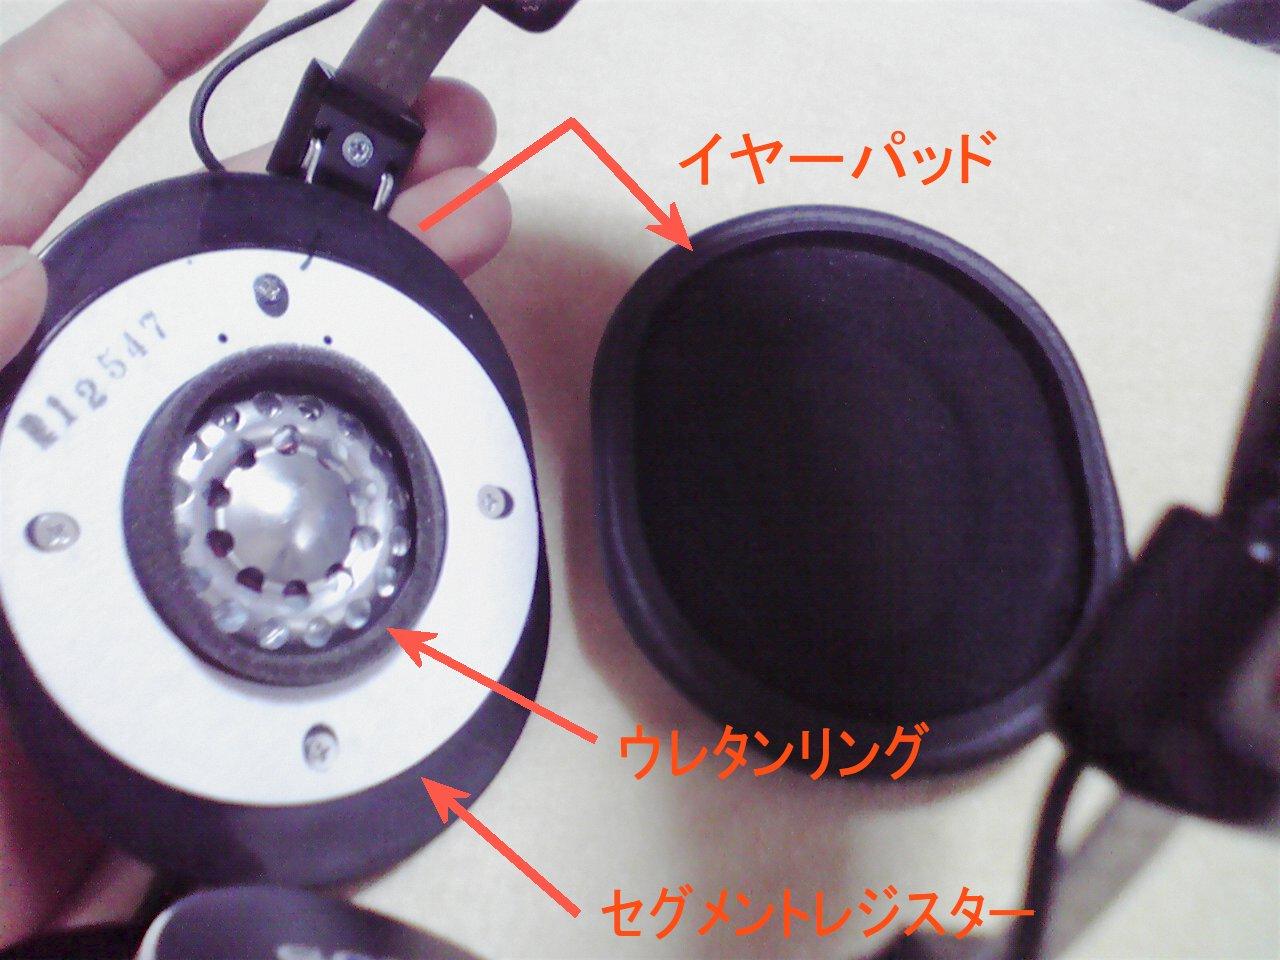 Mdr-cd900st 08